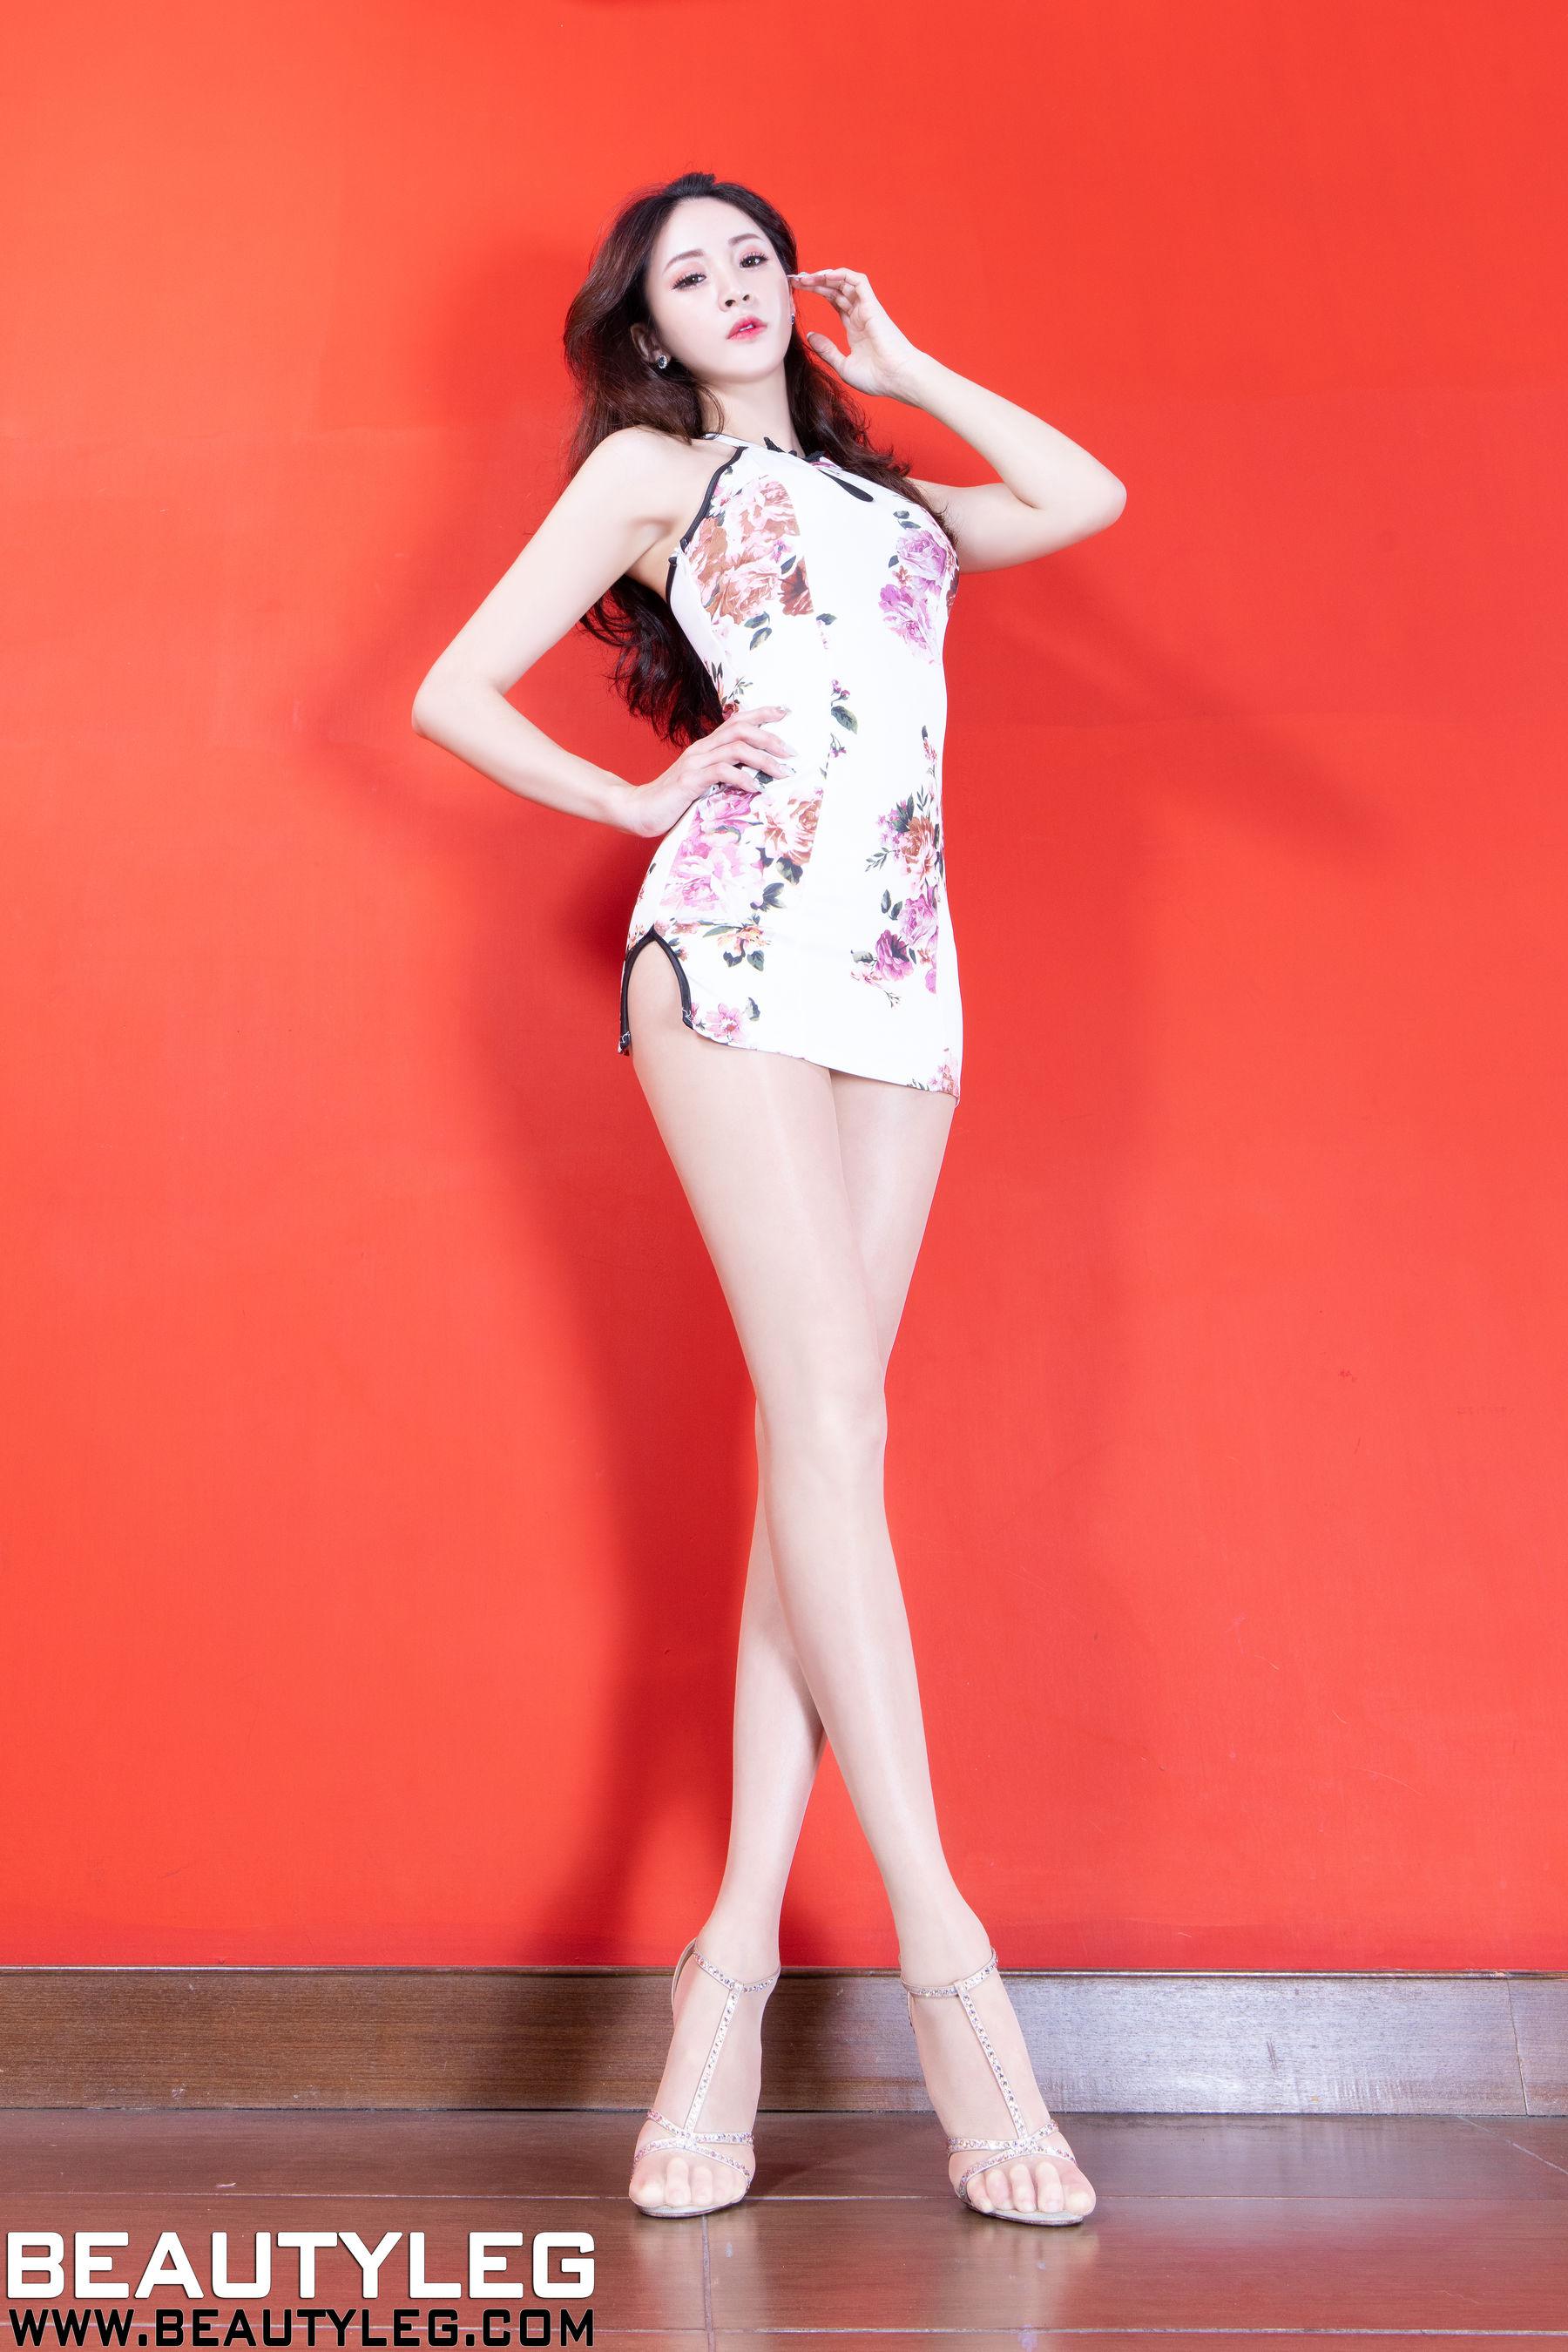 VOL.1395 [Beautyleg]丝袜美腿高跟:Lola雪岑(腿模Lola)超高清个人性感漂亮大图(34P)